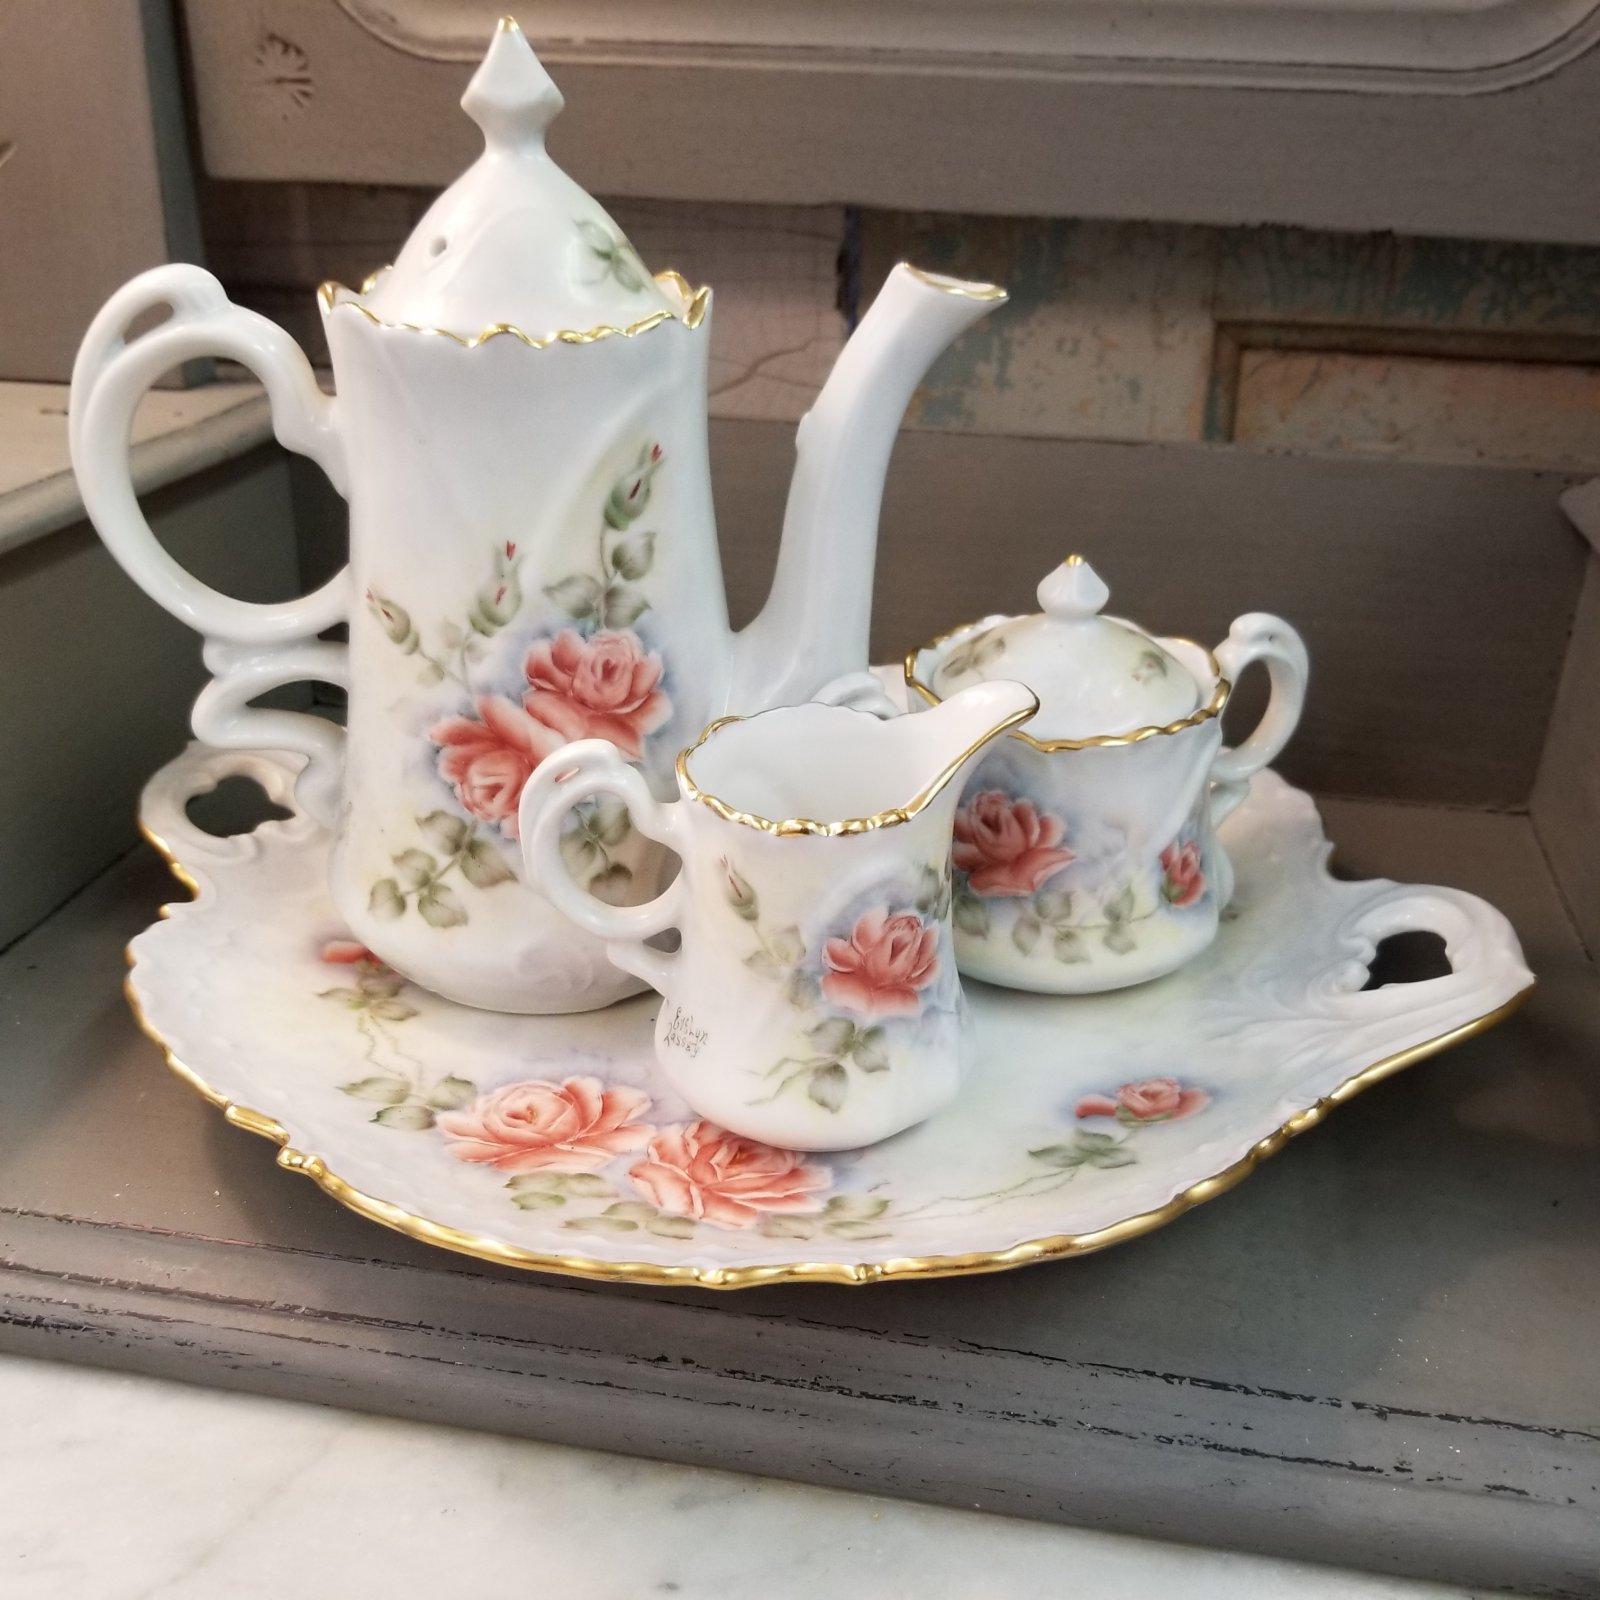 Set of 4 Hand Painted Ceramic Plate, Teapot, Creamer & Sugar